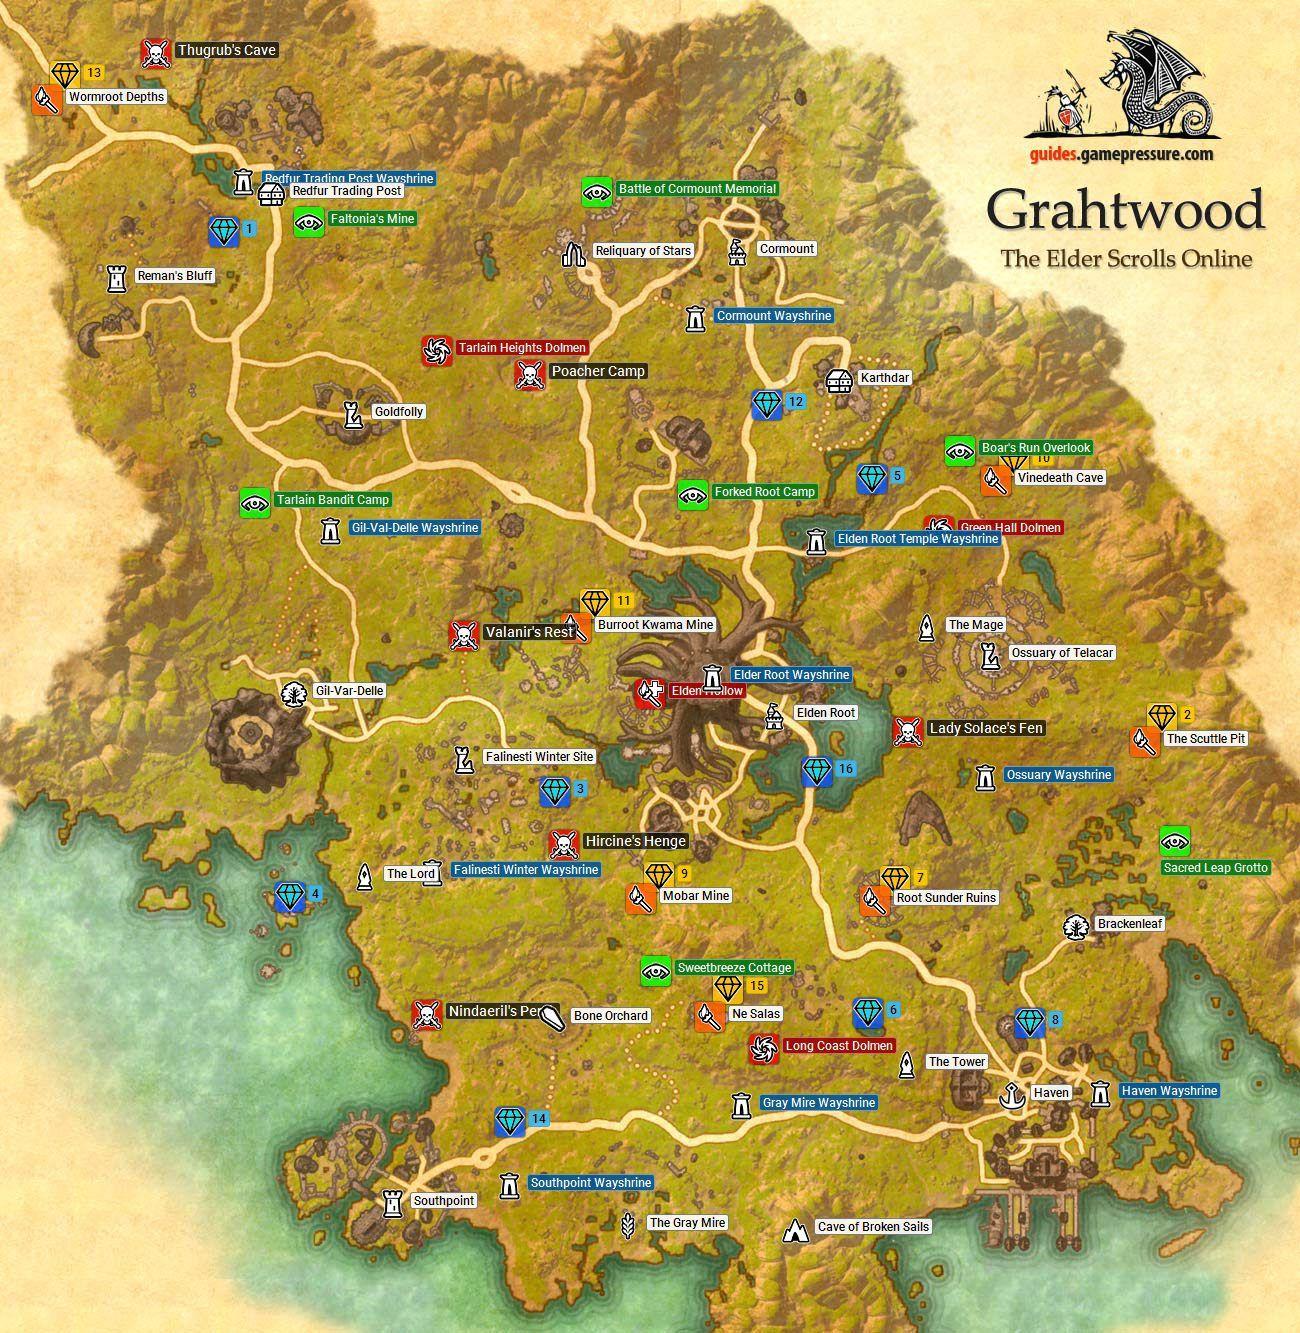 The Elder Scrolls Online Grahtwood Elder scrolls